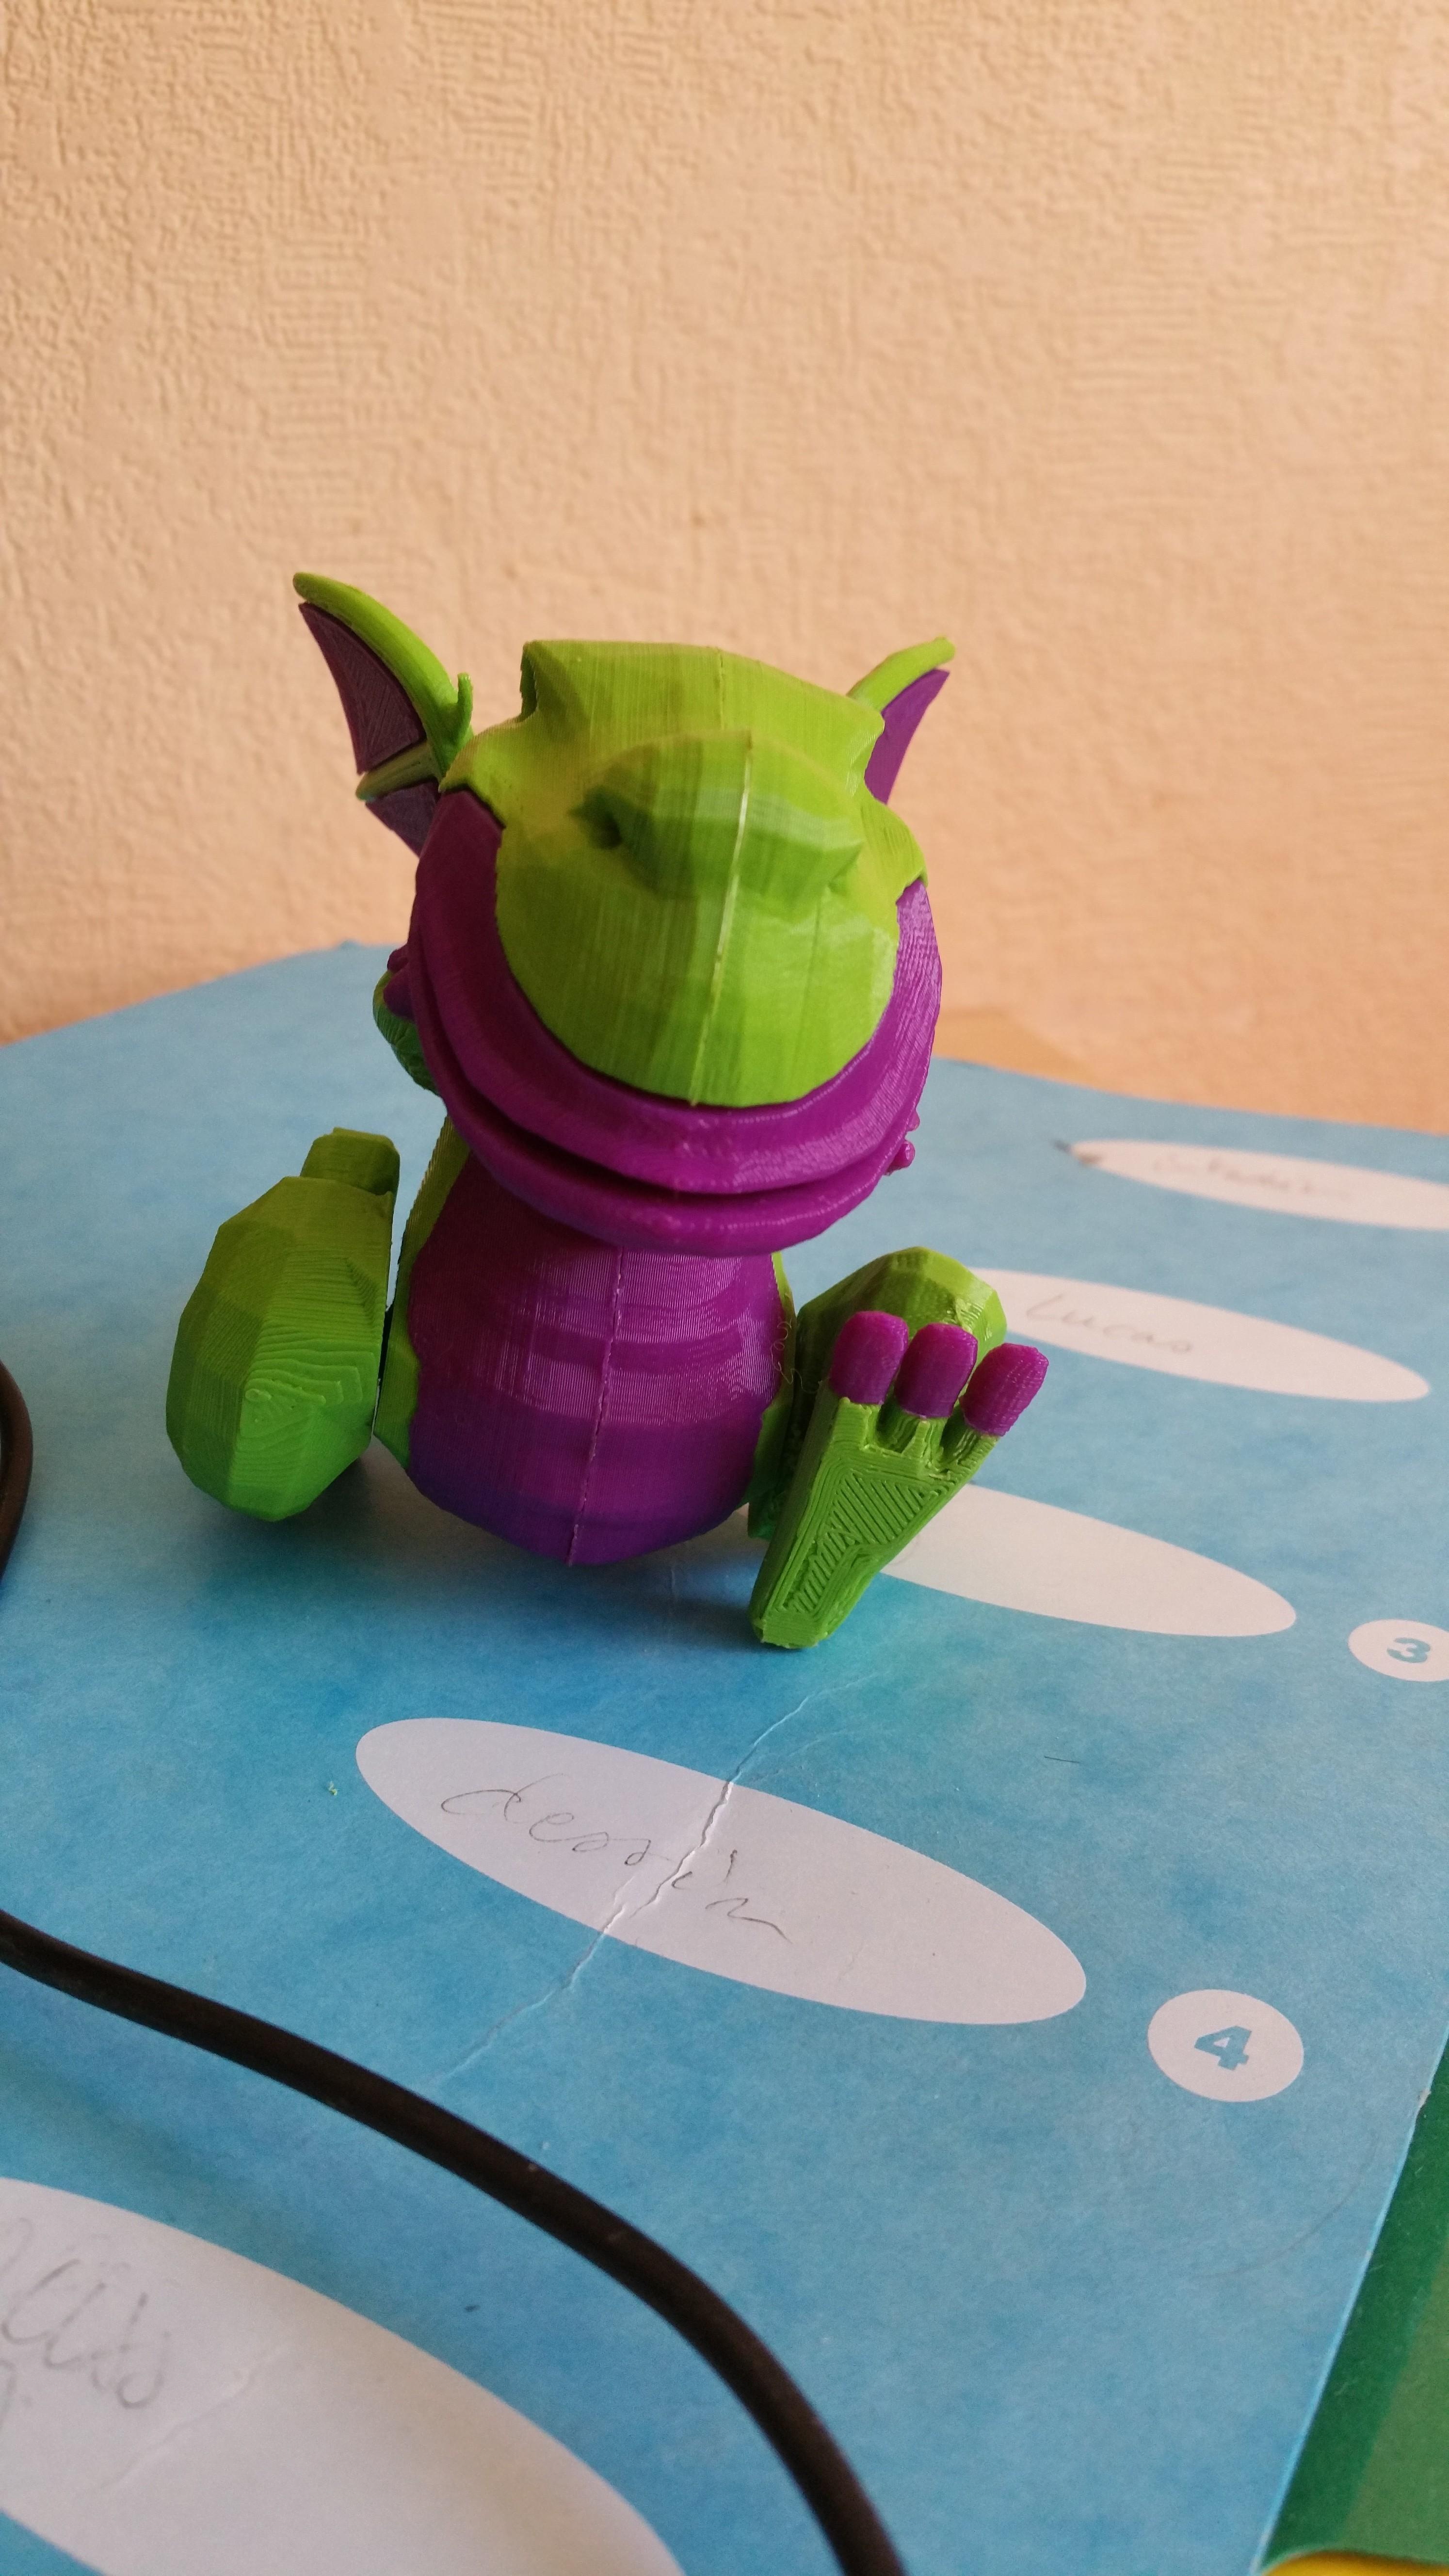 dargFace.jpg Download free STL file Dragon bicolor • 3D printer model, proteine